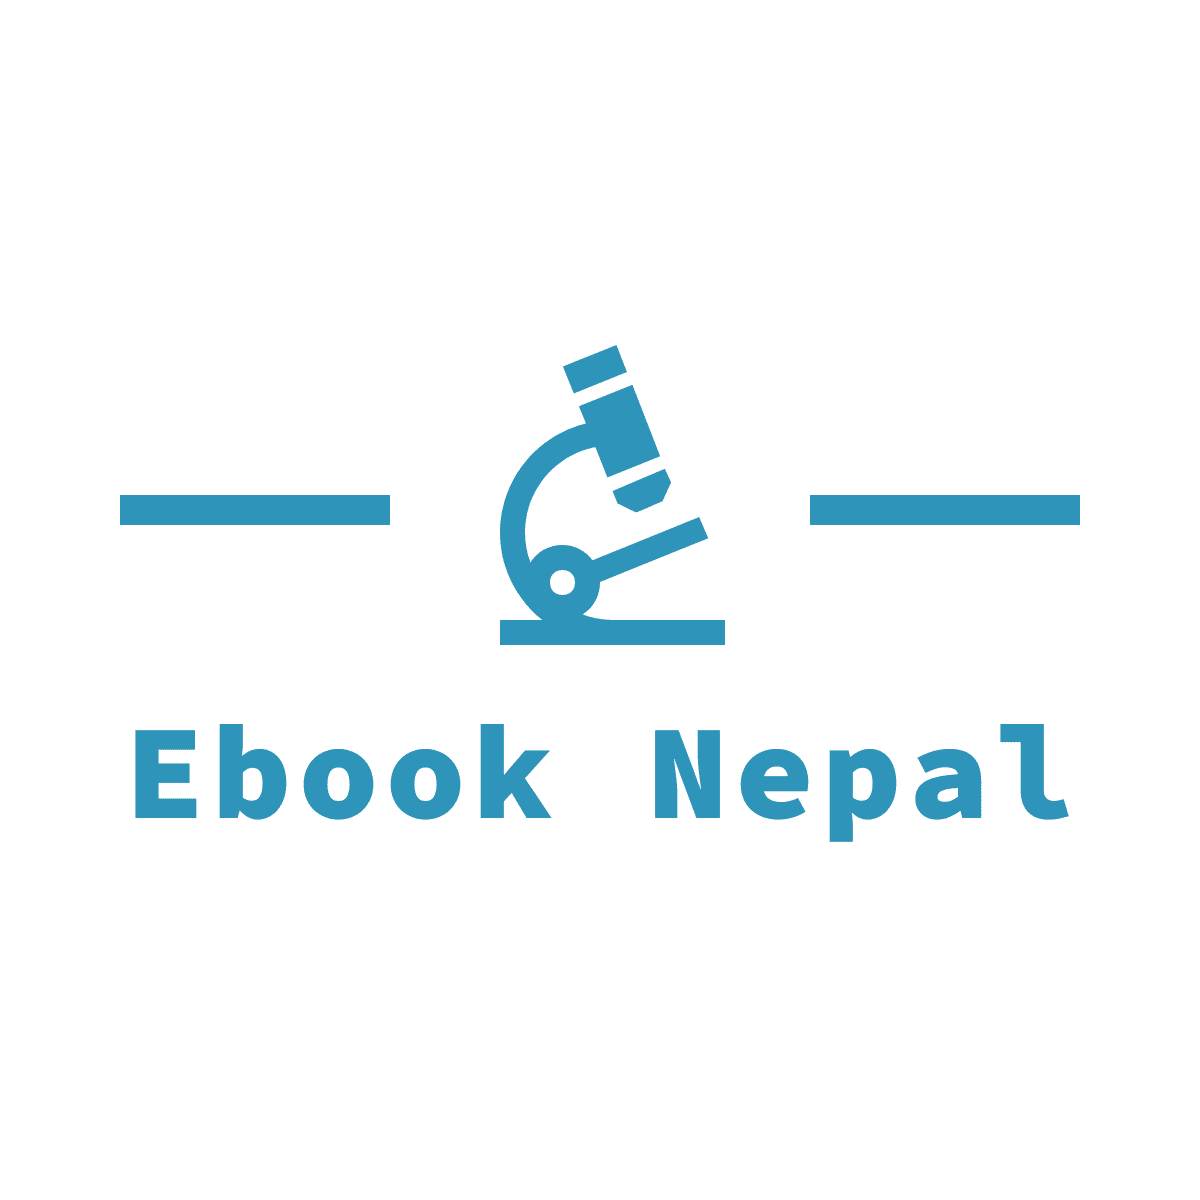 EbookNepal.COM